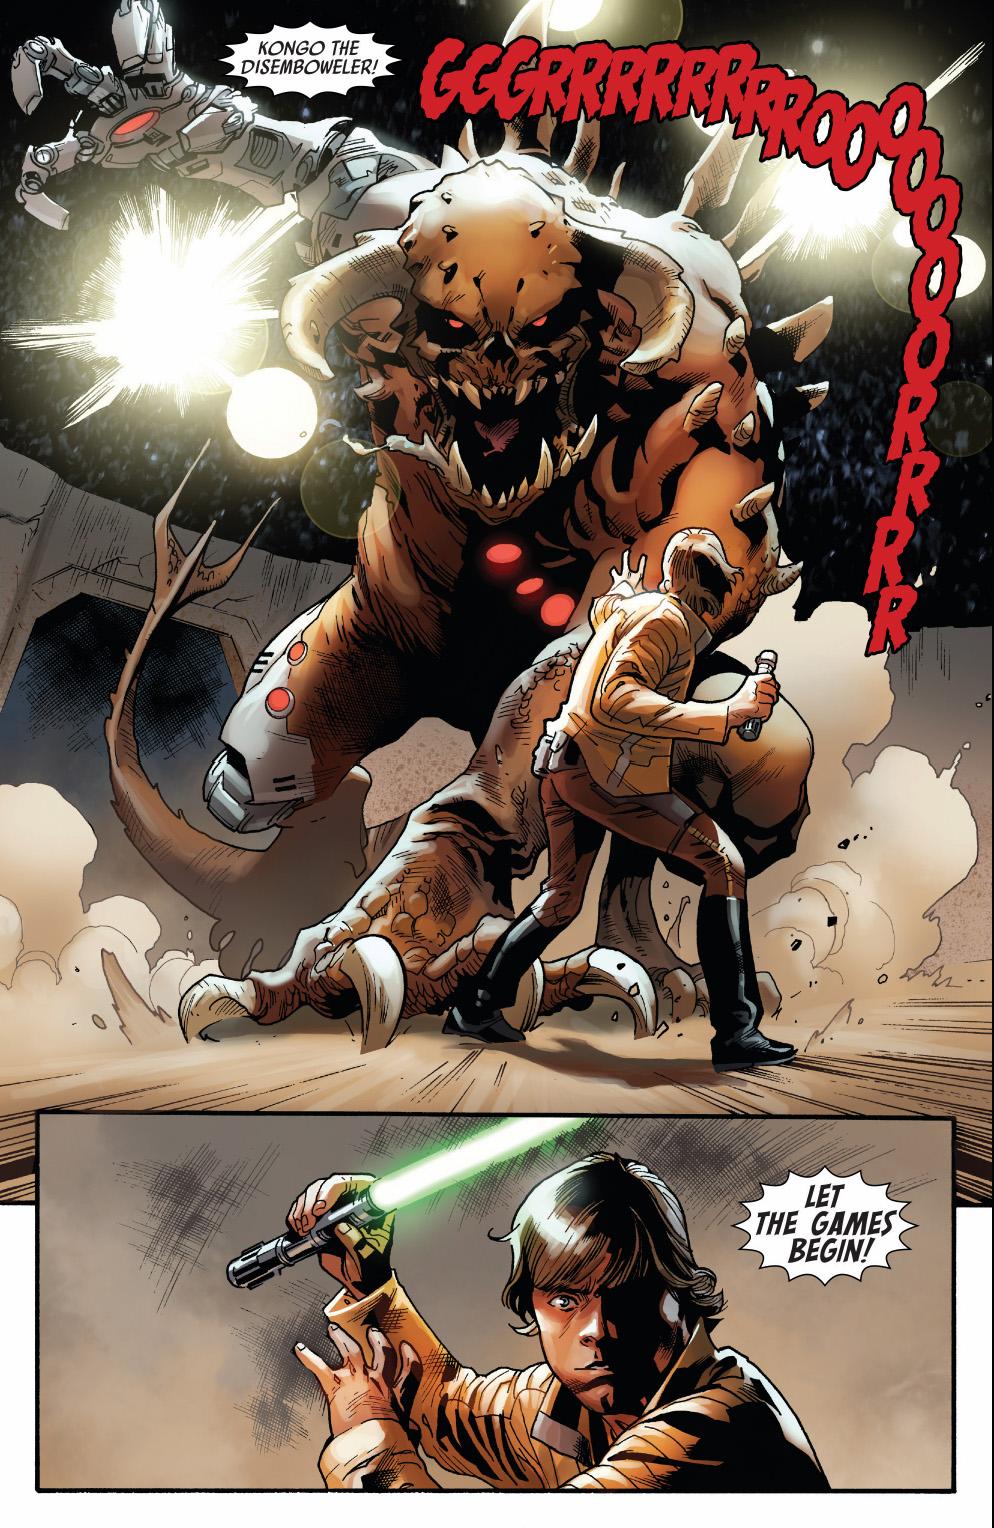 luke skywalker vs kongo the disemboweler